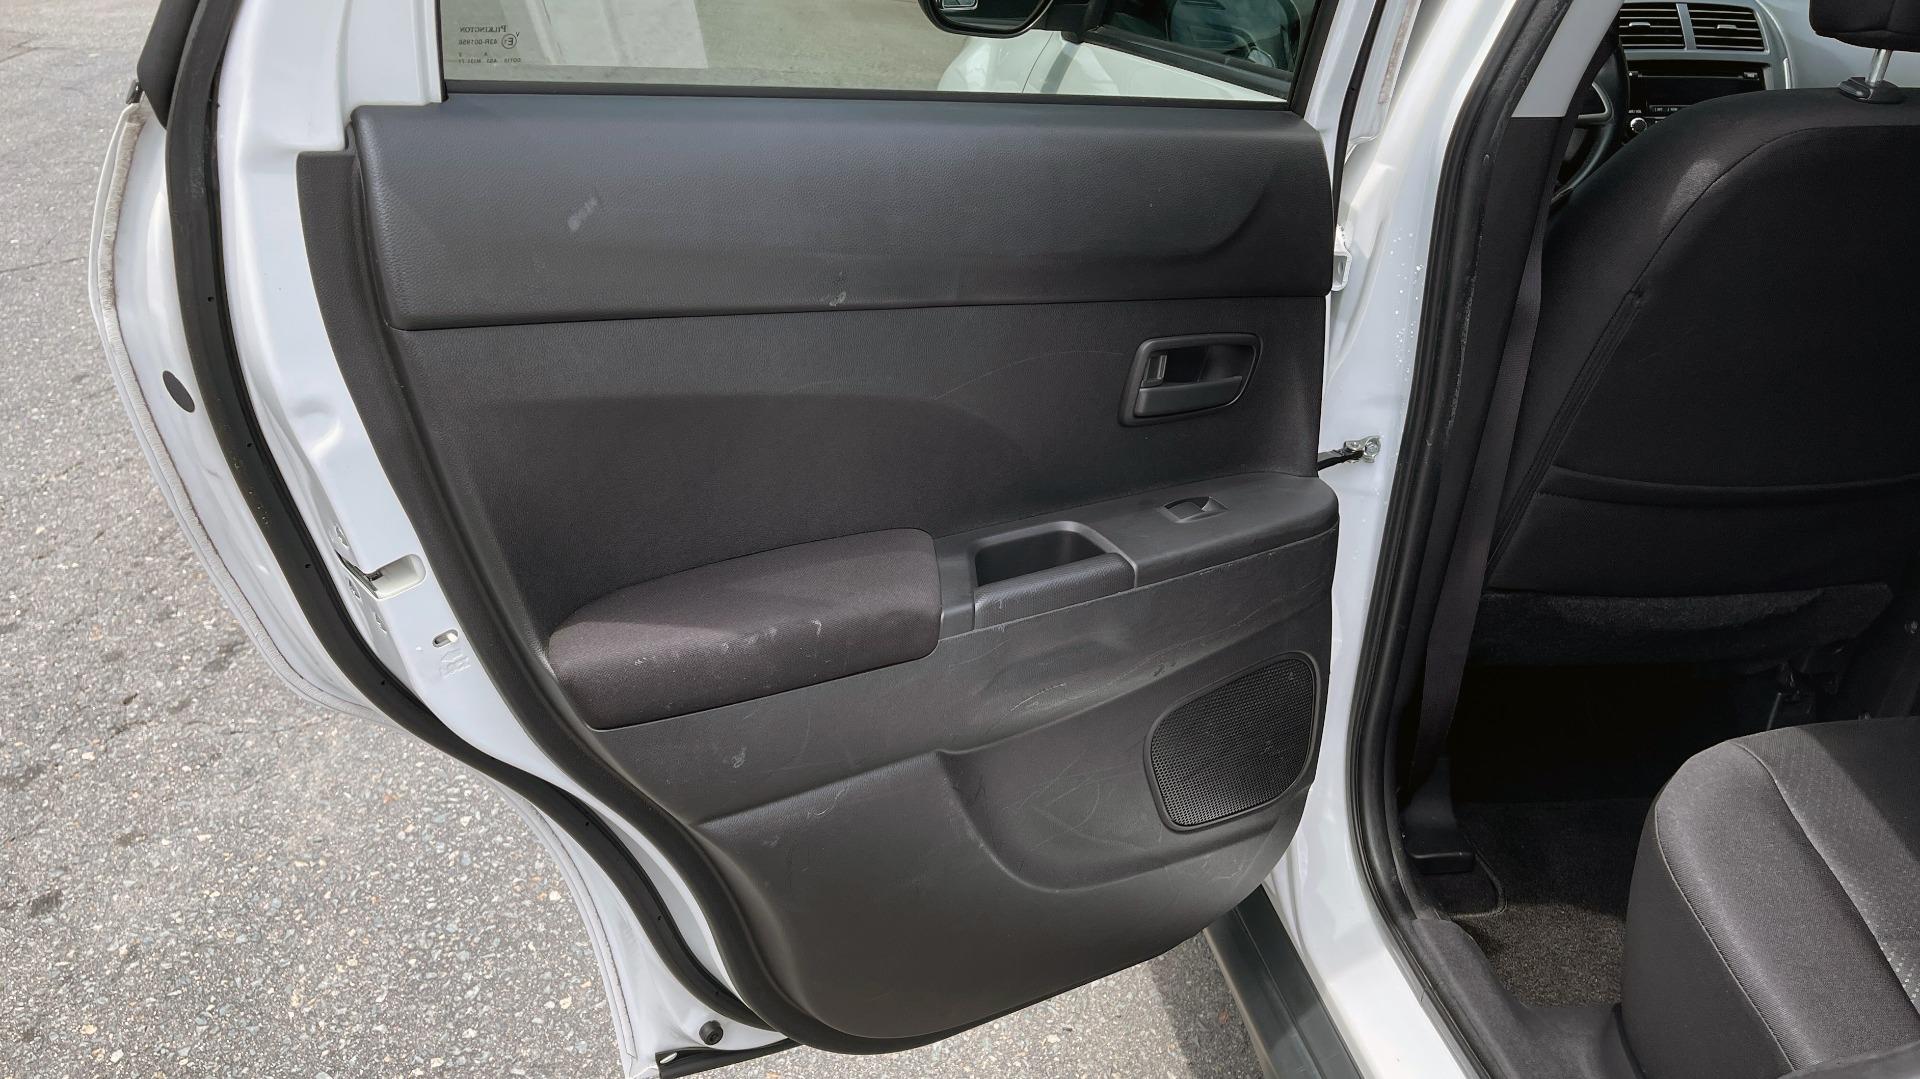 Used 2014 Mitsubishi OUTLANDER SPORT ES 2WD / 2.0L / CVT TRANS / 18IN WHEELS / 31MPG for sale $8,495 at Formula Imports in Charlotte NC 28227 45